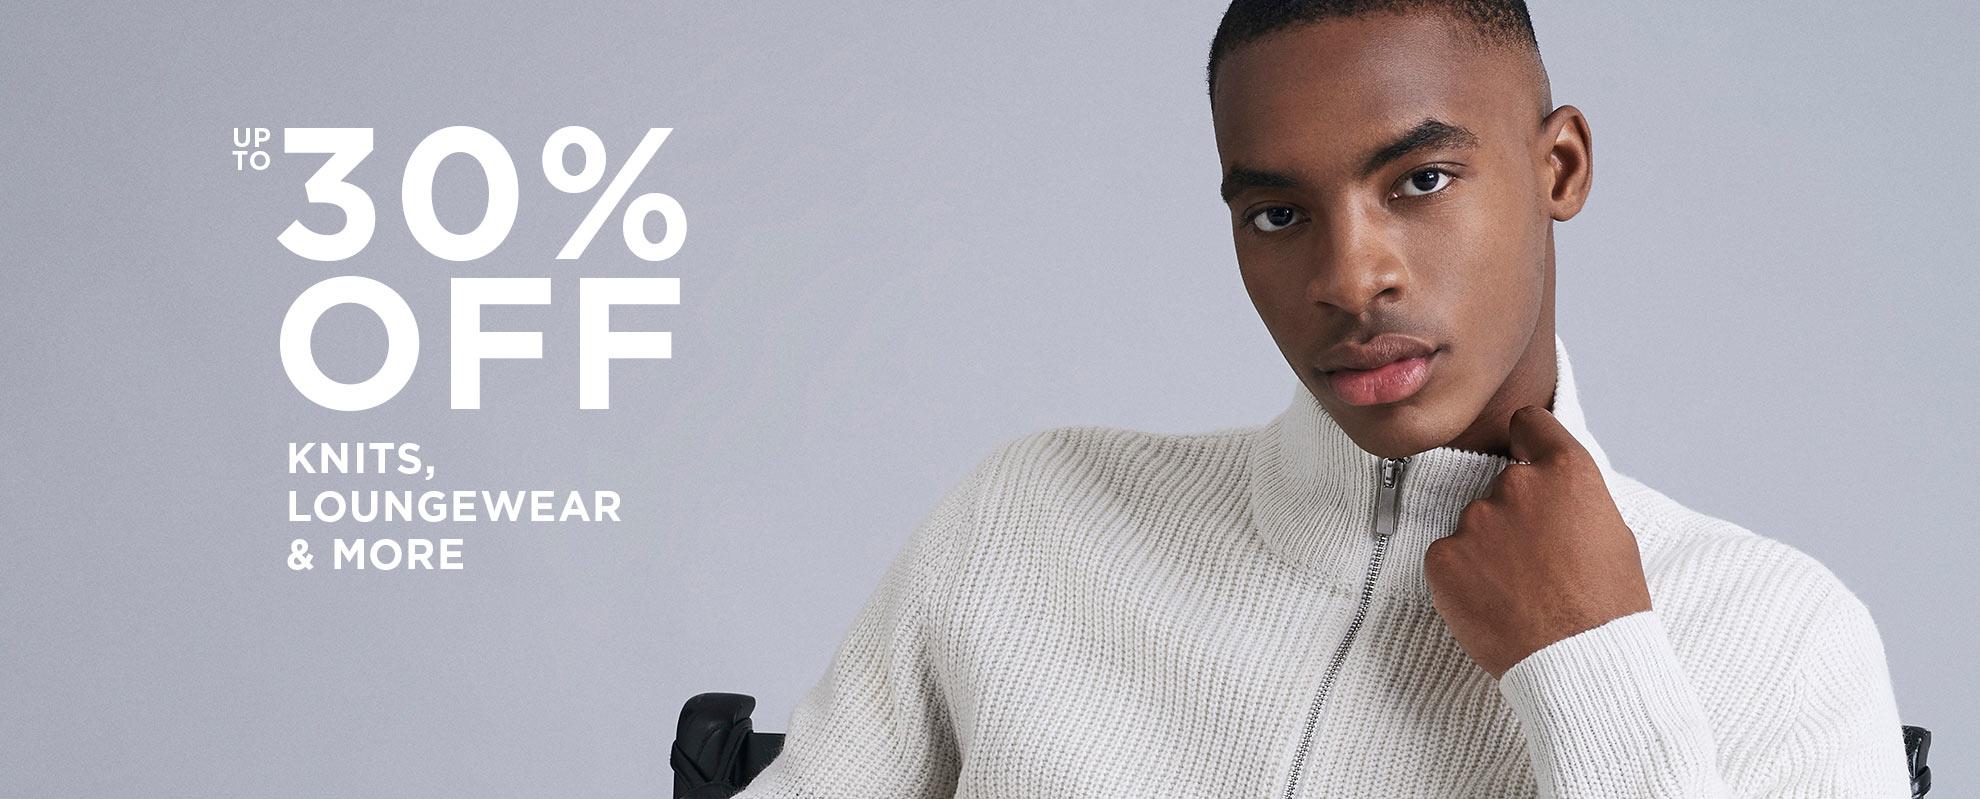 Burton: up to 30% off knits, loungewear & more men's clothing